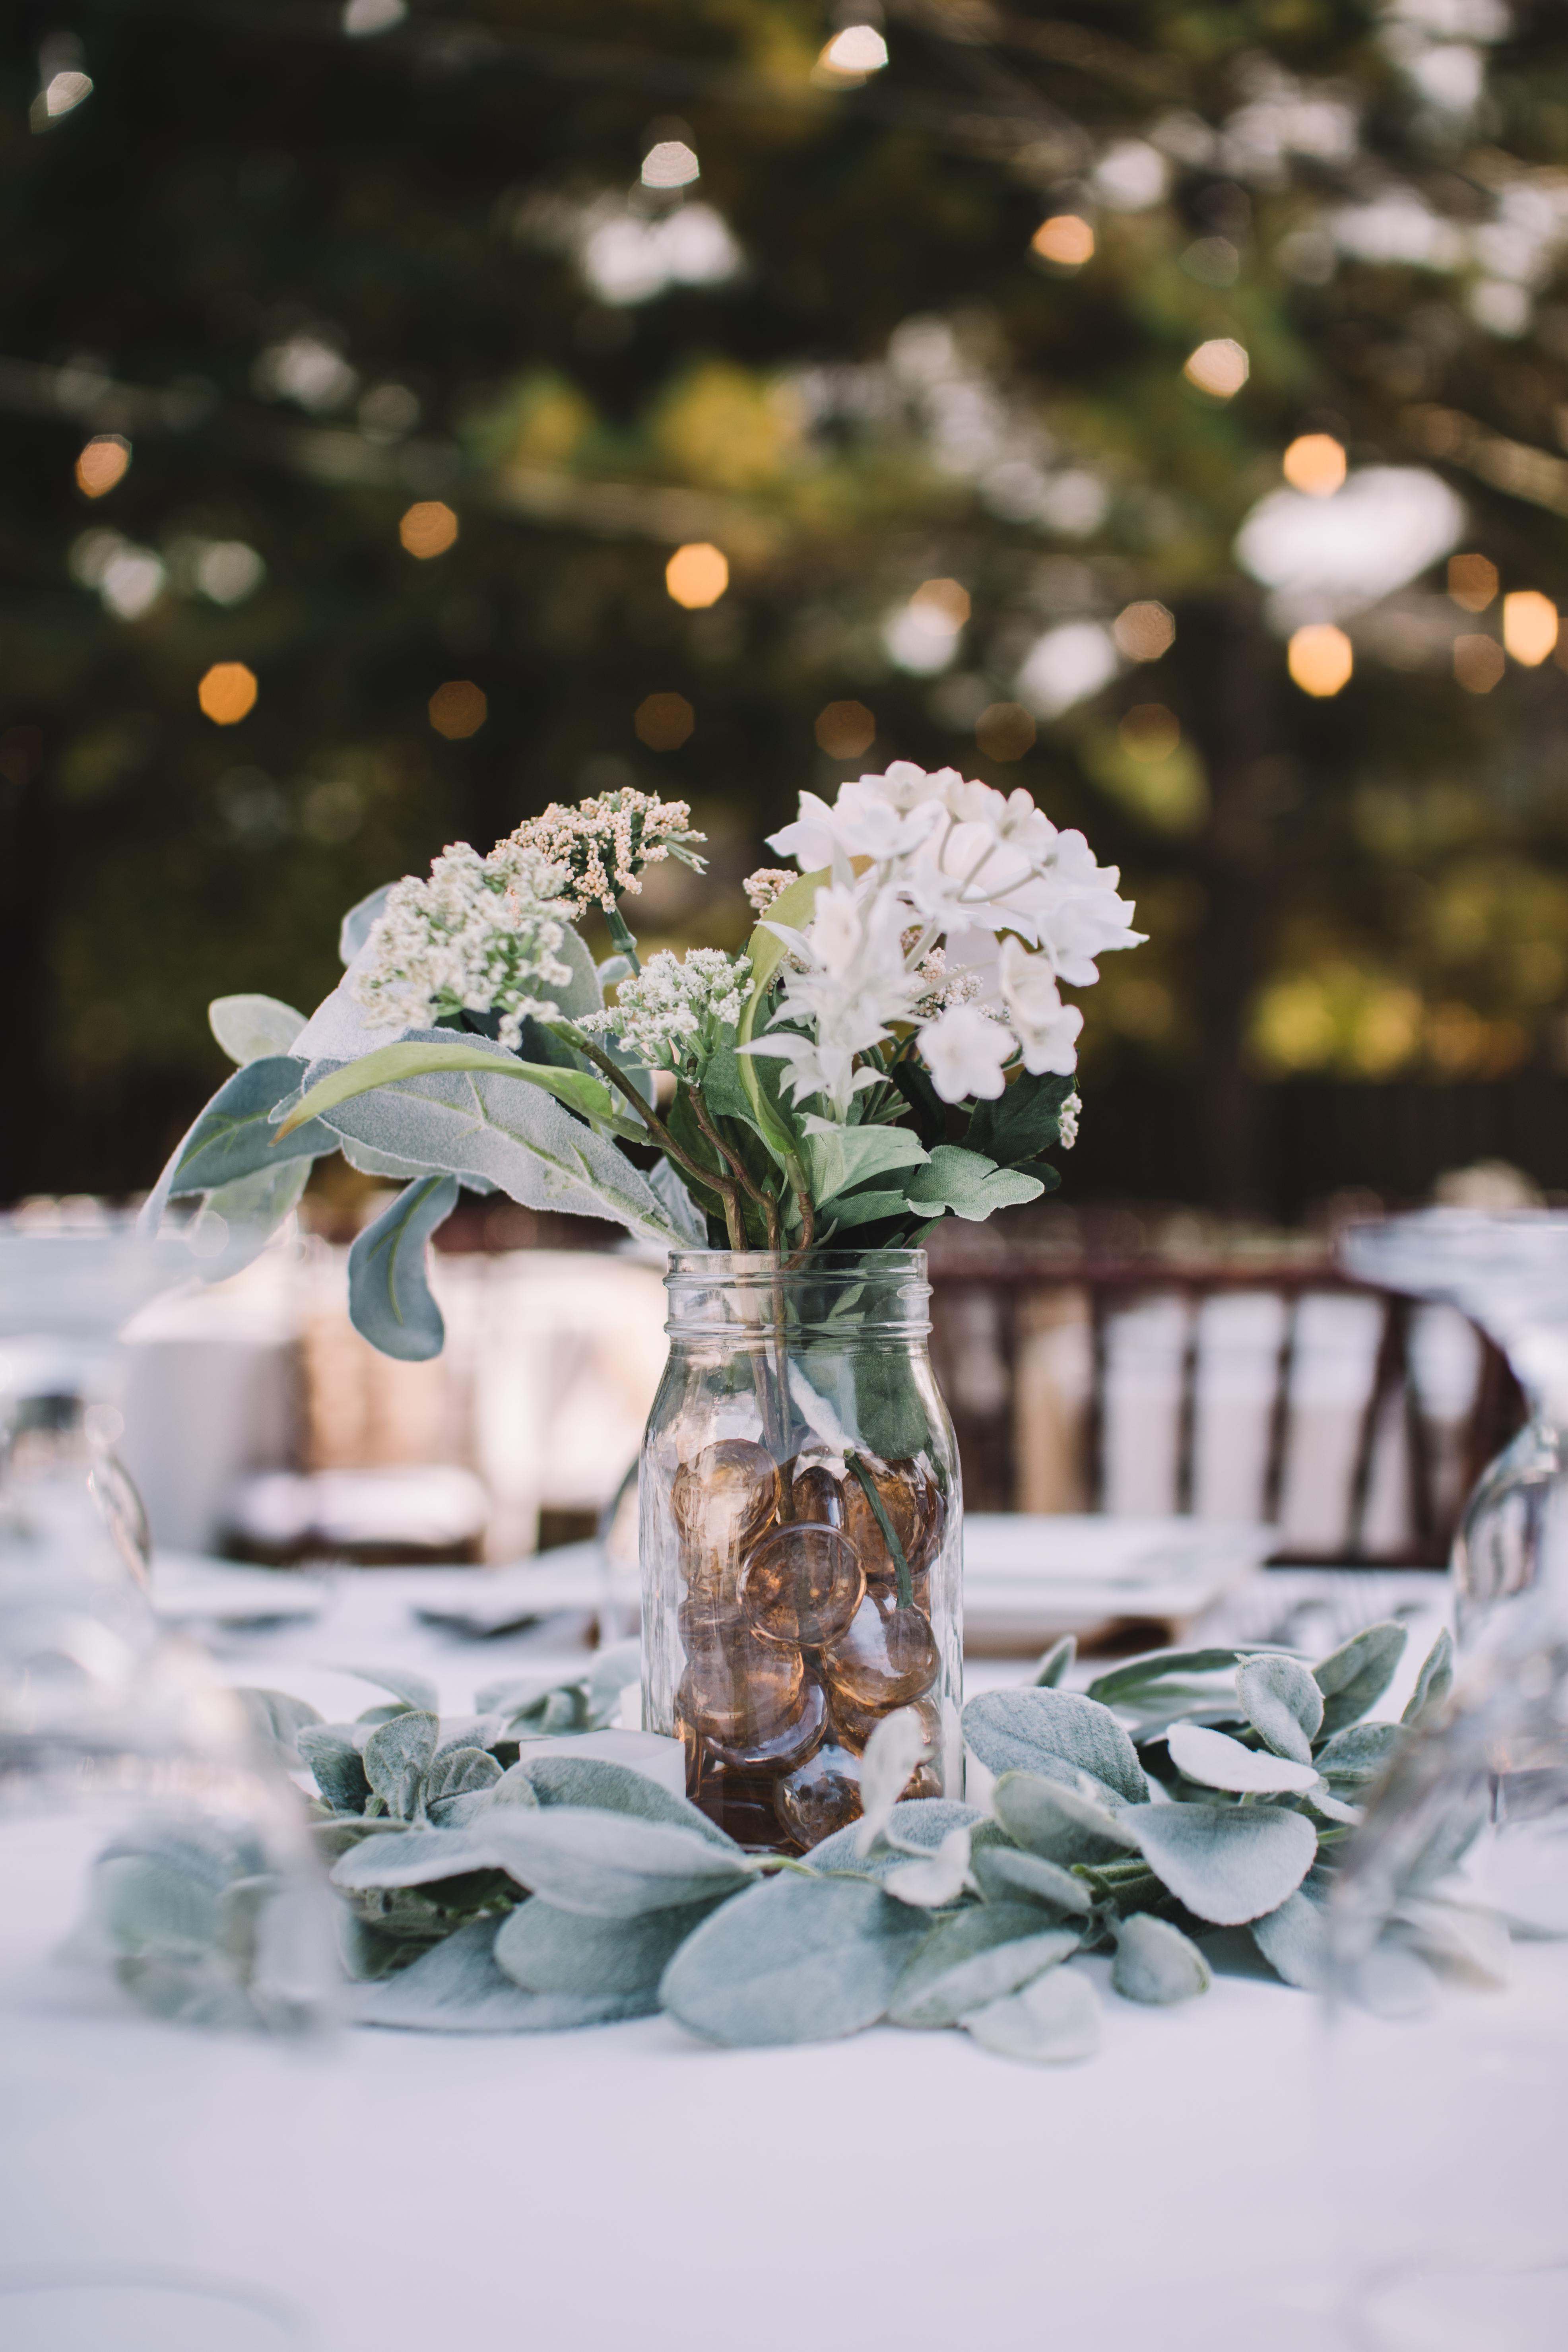 springfield il wedding decorations, springfield il outdoor wedding, springfield illinois wedding pho